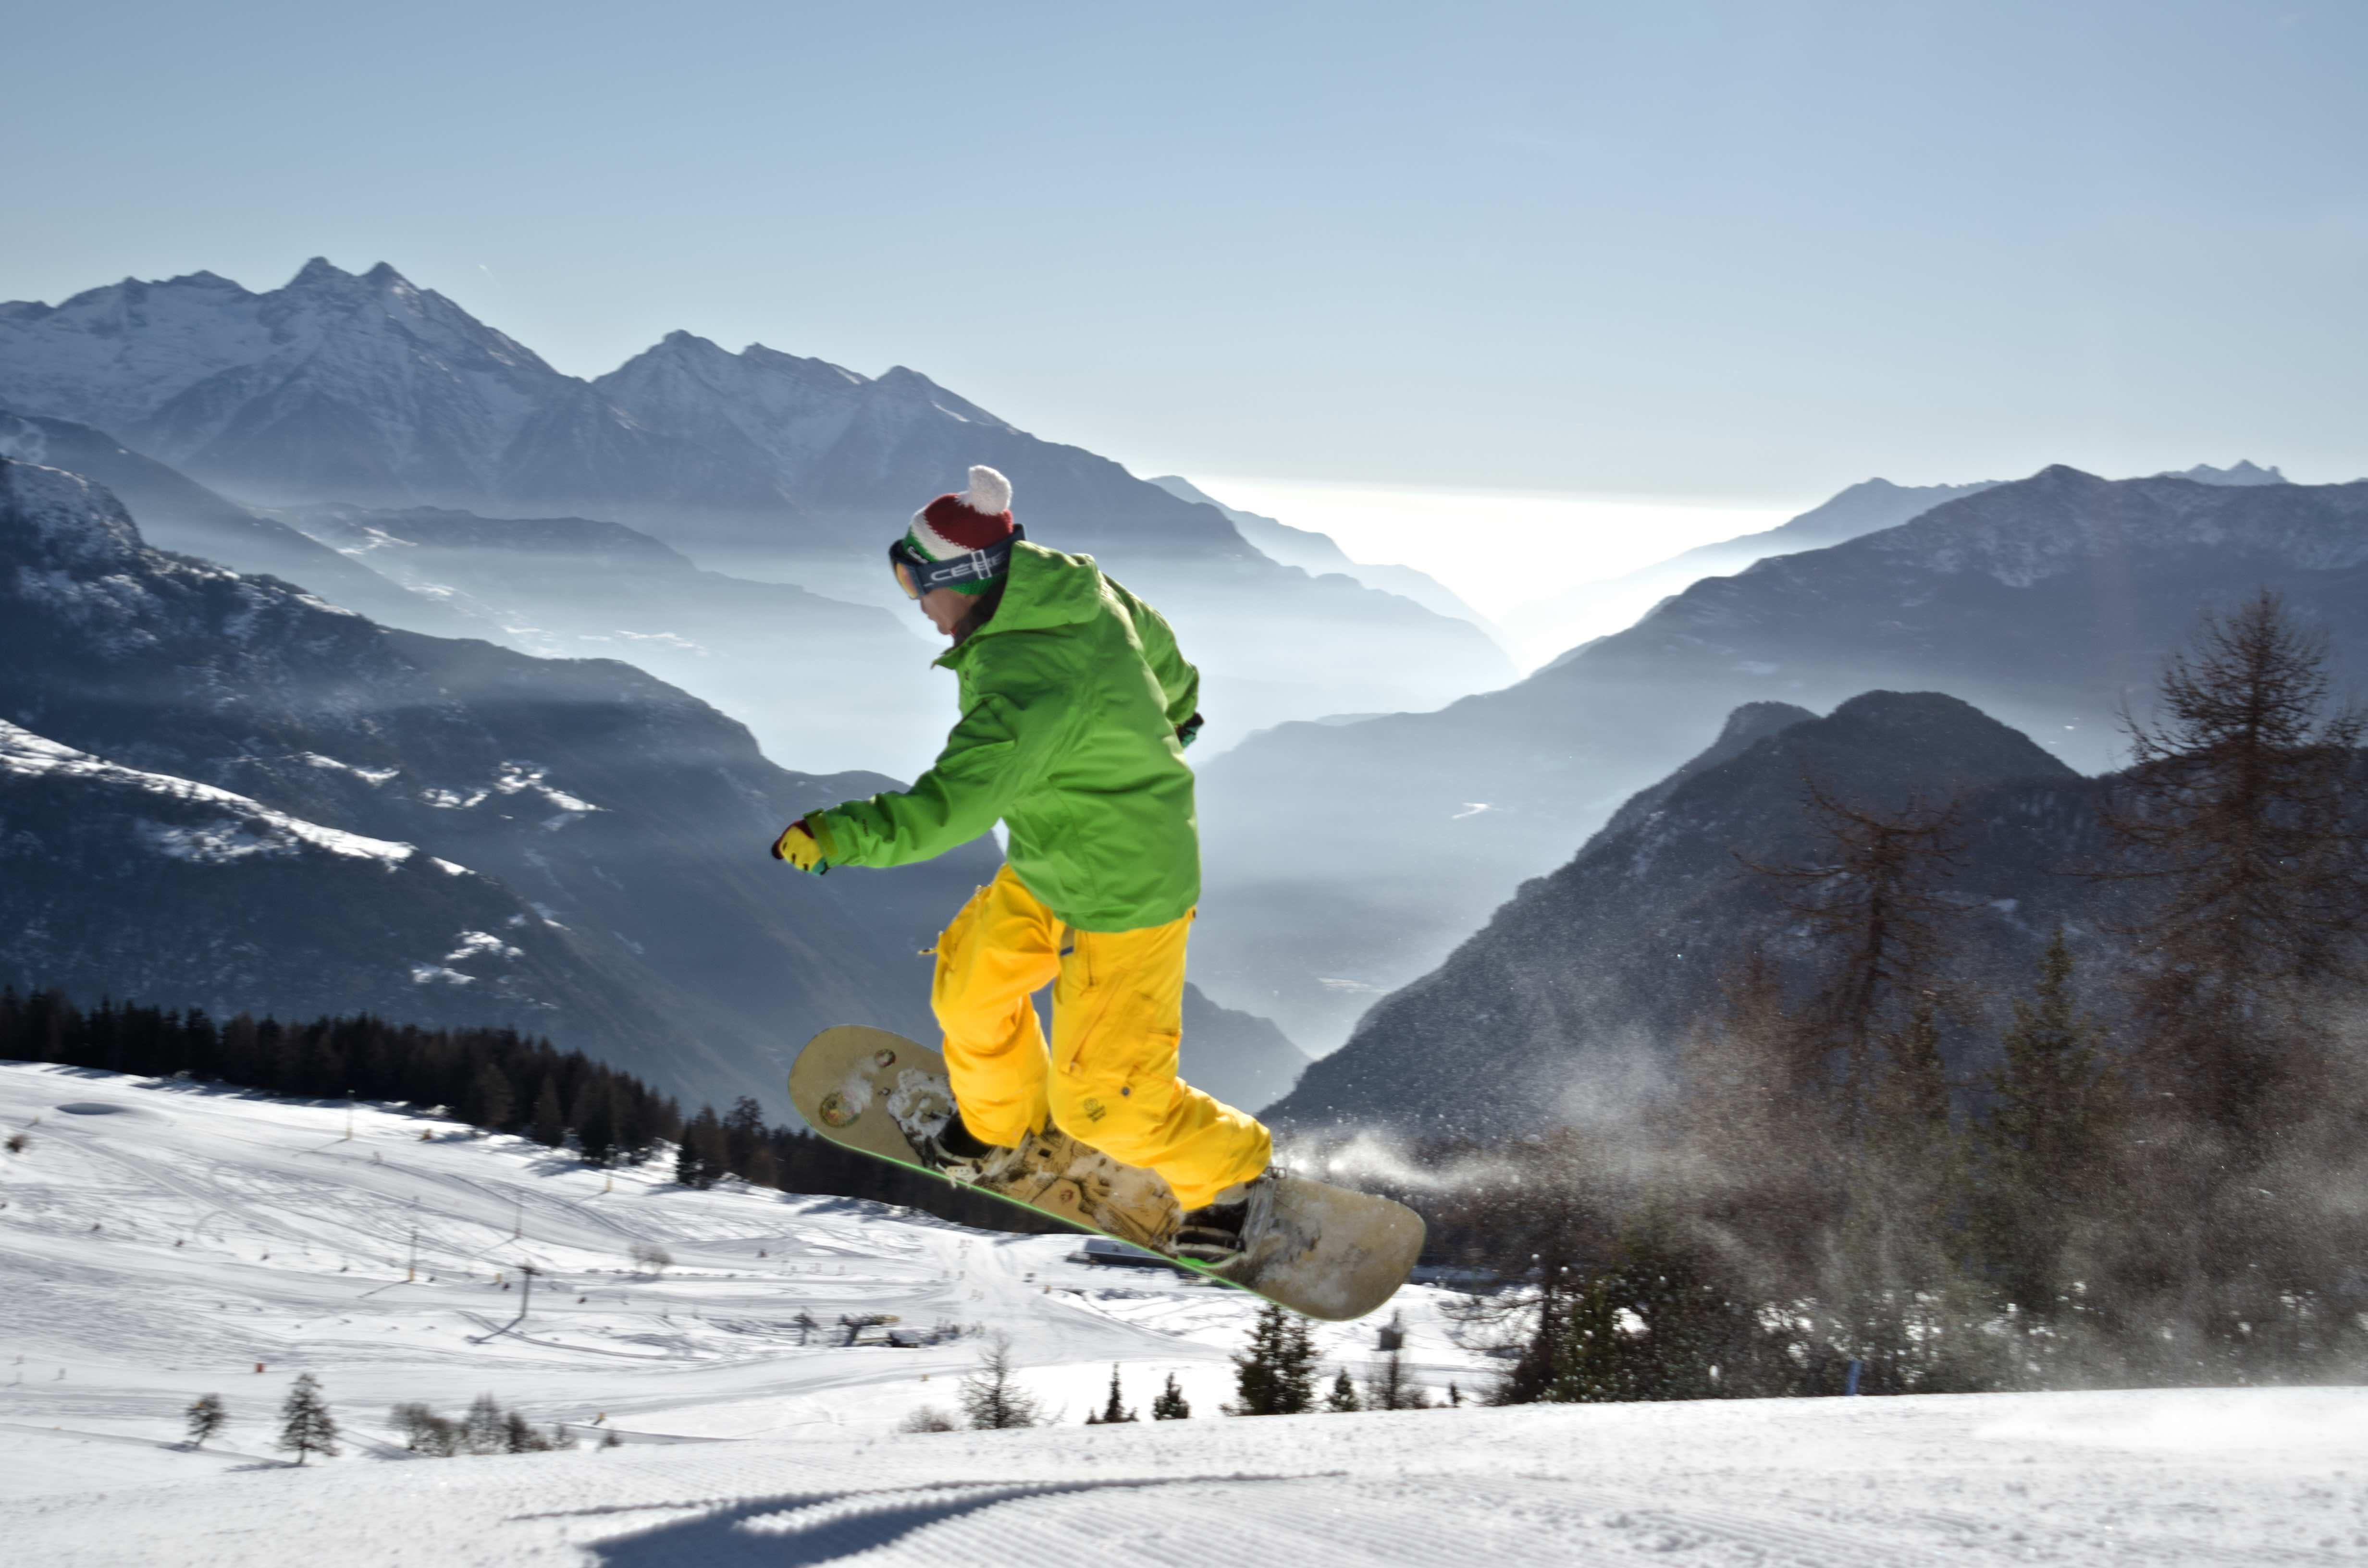 Torgnon: vacanze in montagna in Valle d'Aosta